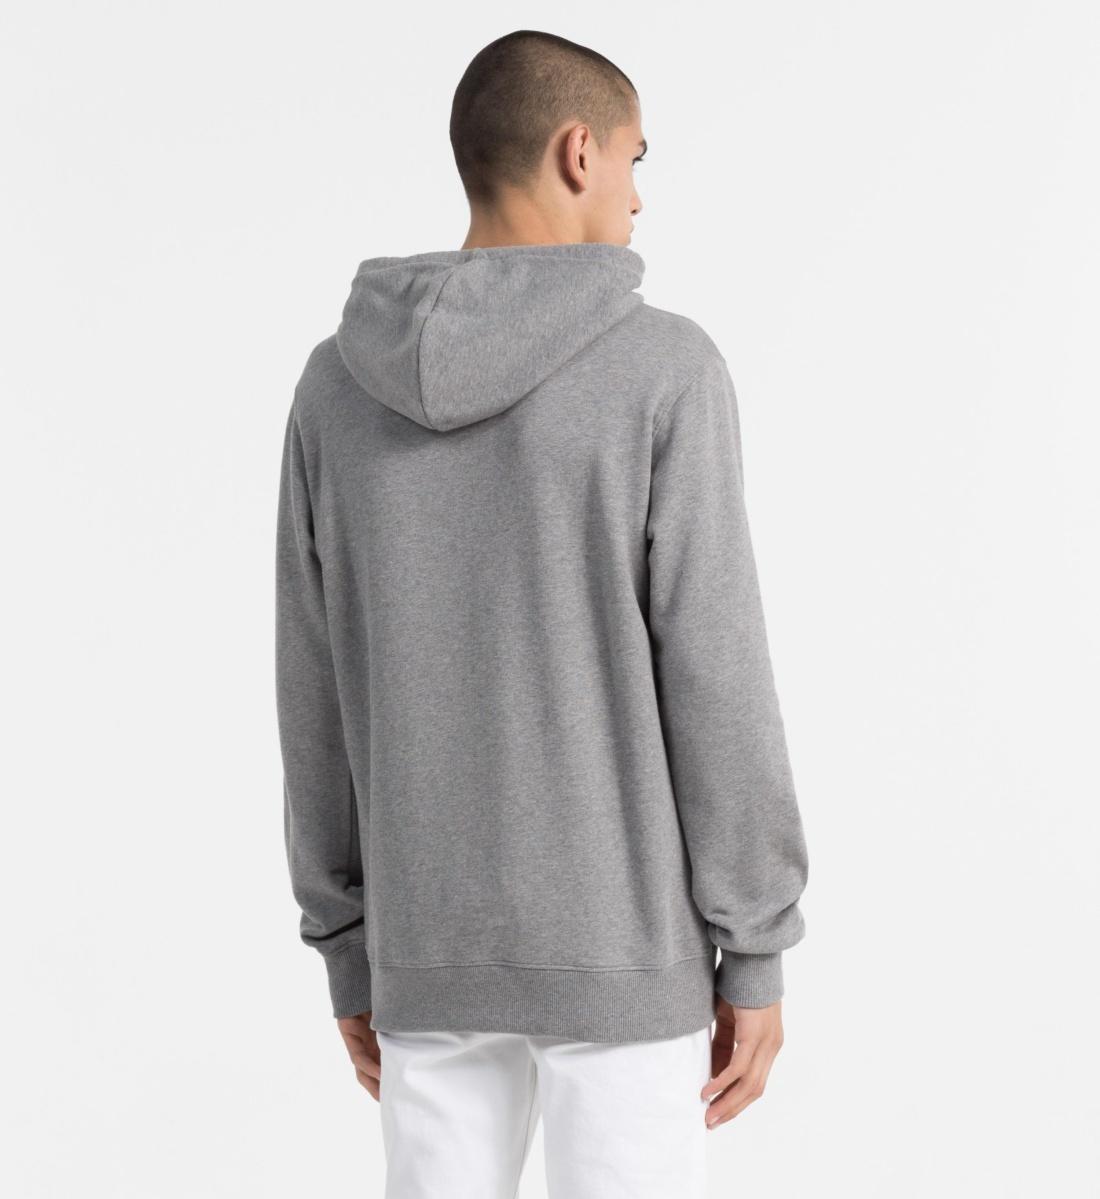 Calvin Klein pánská šedá mikina - Mode.cz afce43b70e